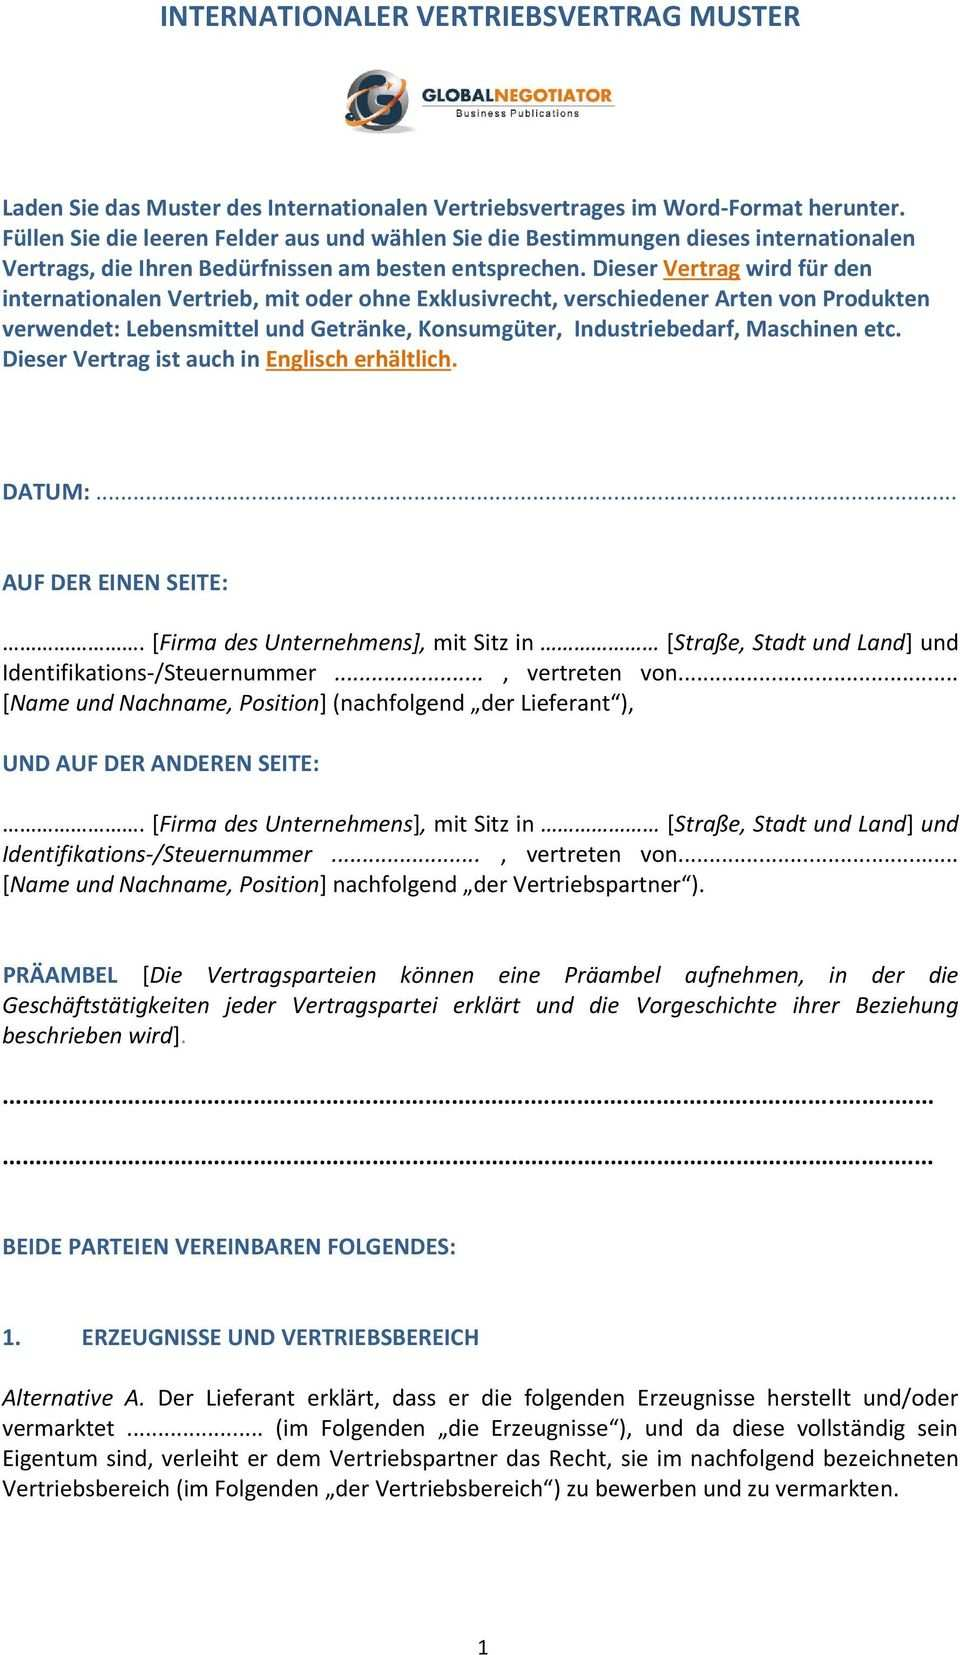 Internationaler Vertriebsvertrag Muster Pdf Free Download